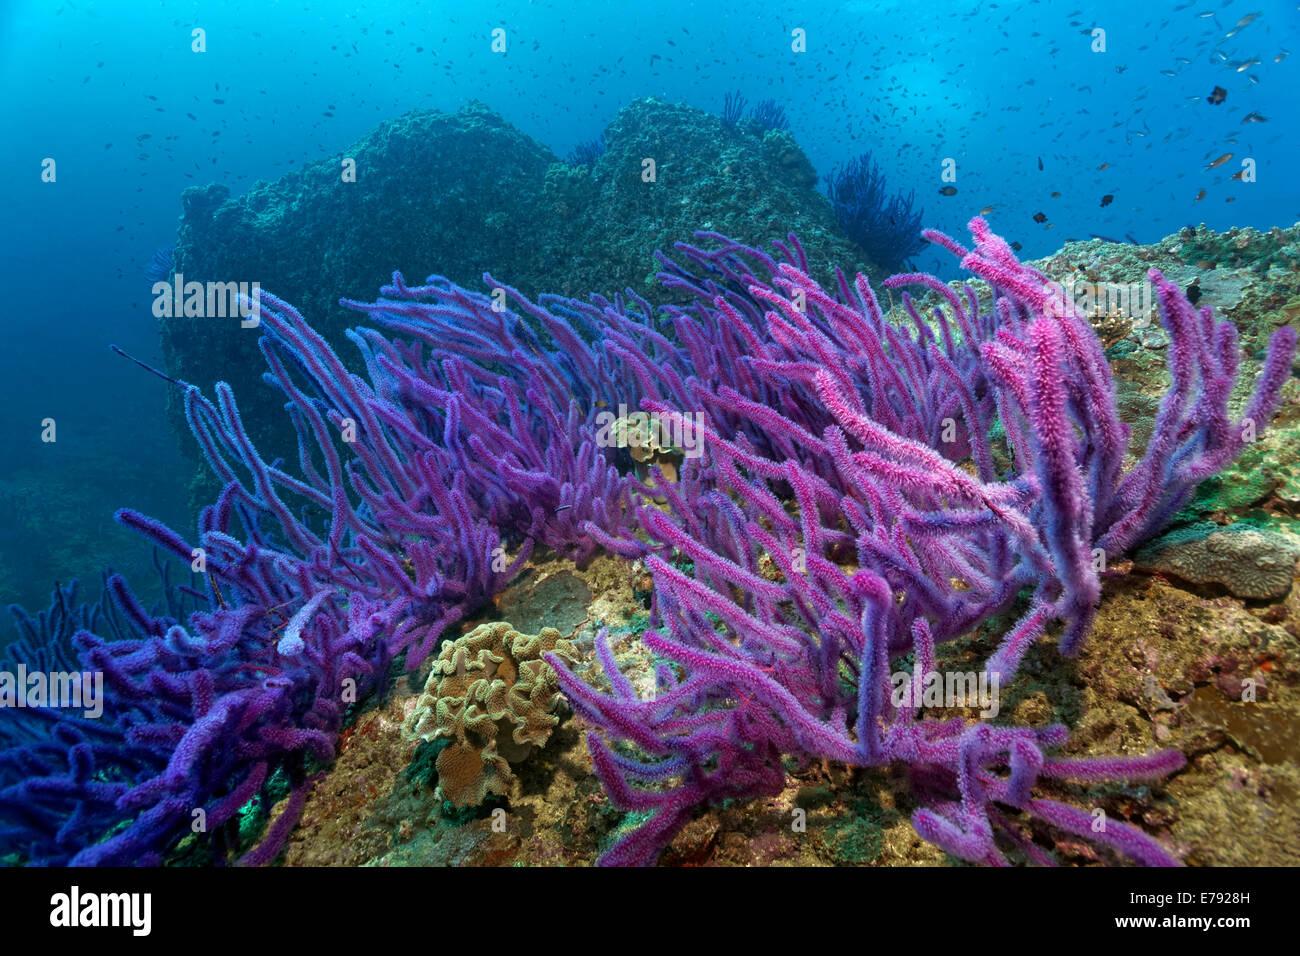 Red sea whips (Ellisella sp.) on a coral reef, Dimaniyat Islands nature reserve, Al Batinah region, Oman - Stock Image